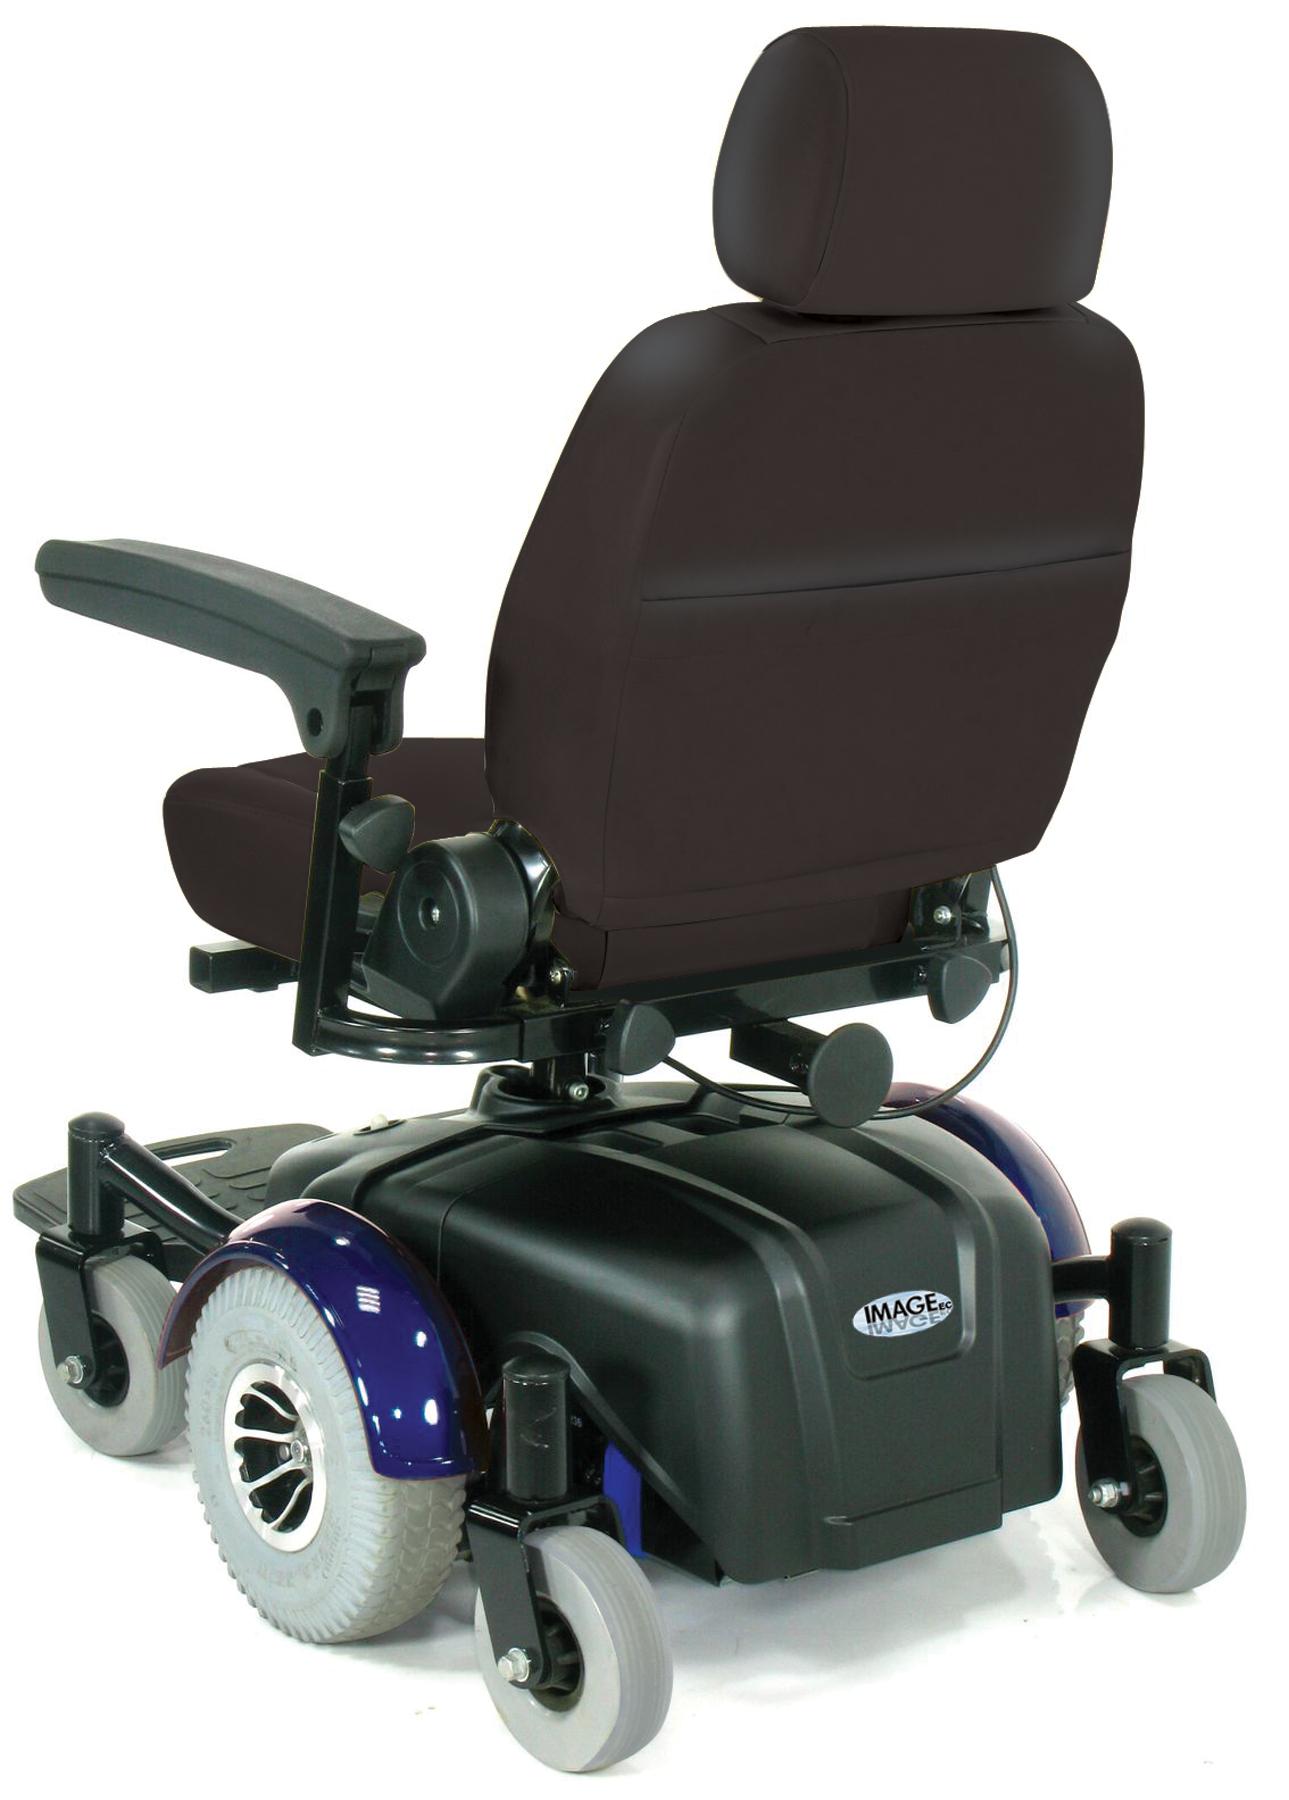 image-ec-mid-wheel-drive-power-wheelchair-2800ecbl-rcl-drive-medical-3.jpg